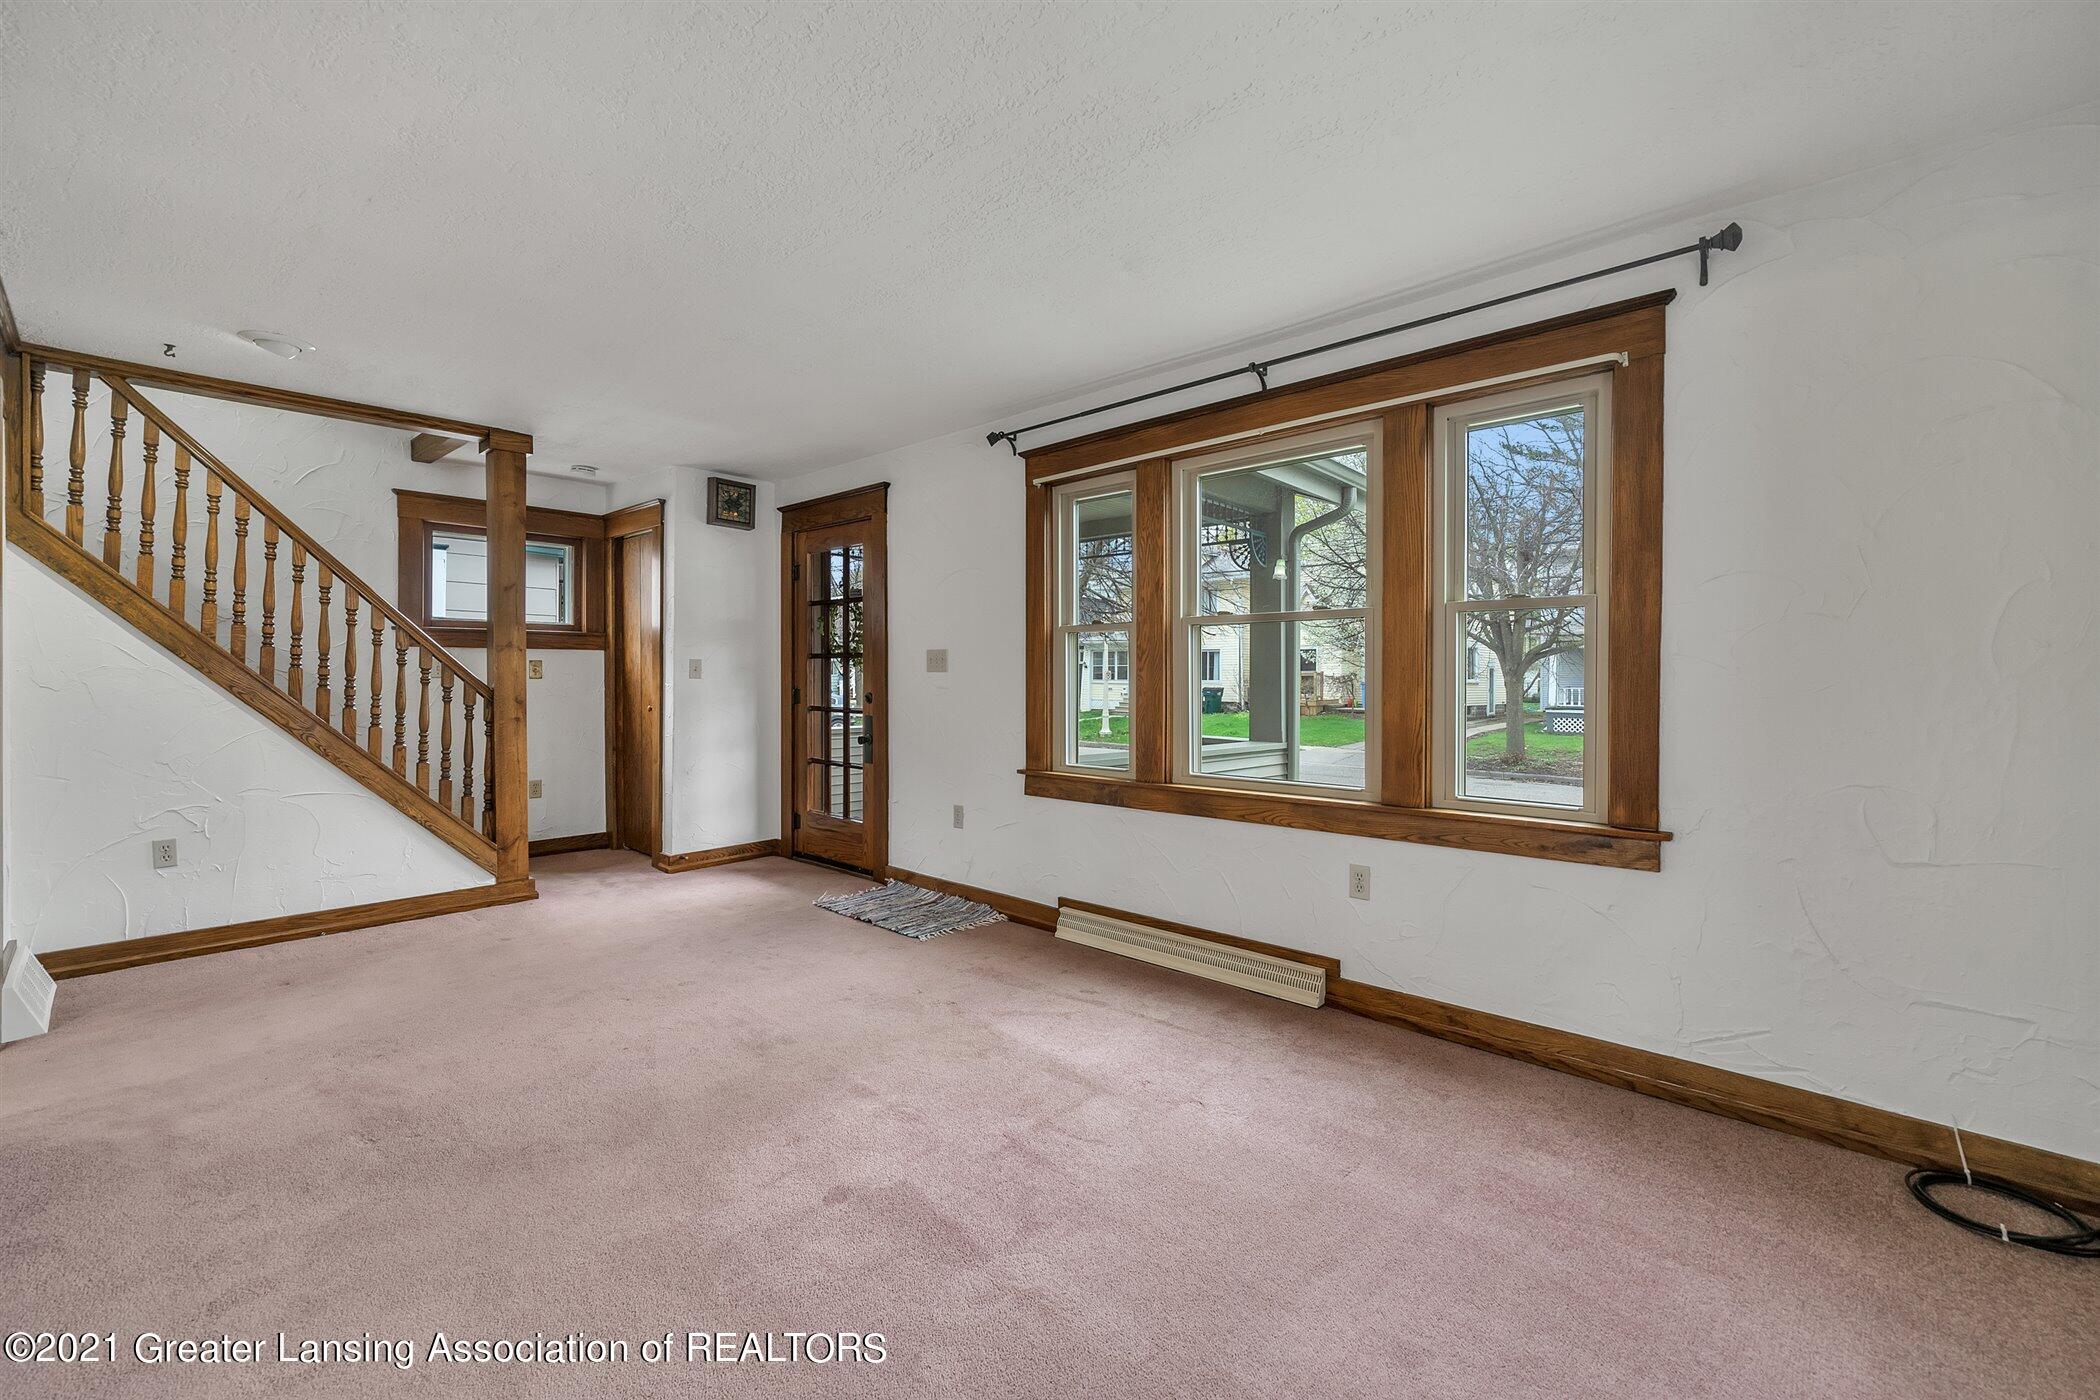 726 N Magnolia Ave - (3) MAIN FLOOR Living Room - 4